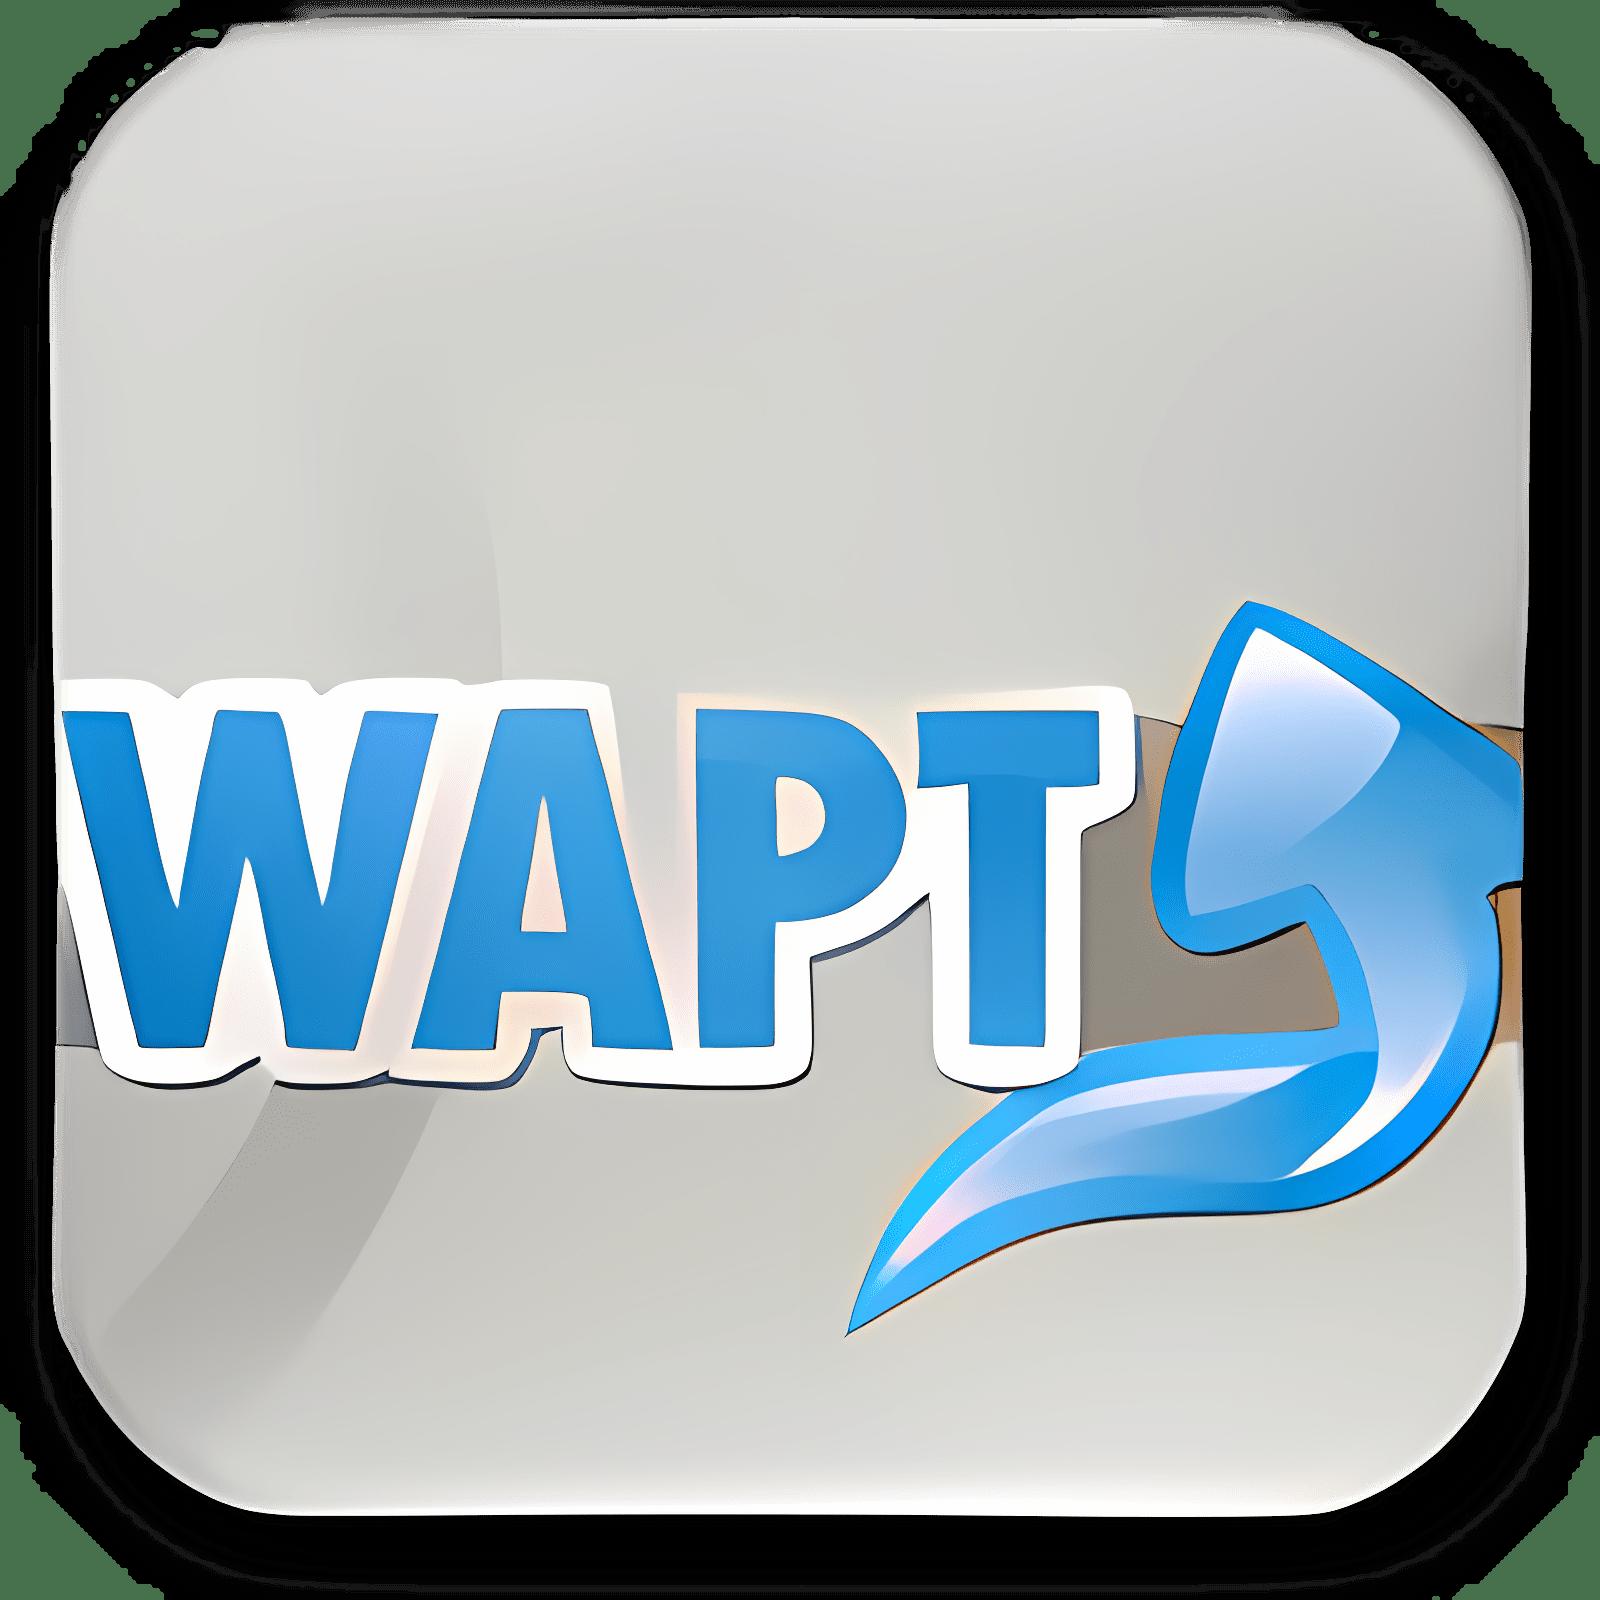 WAPT 6